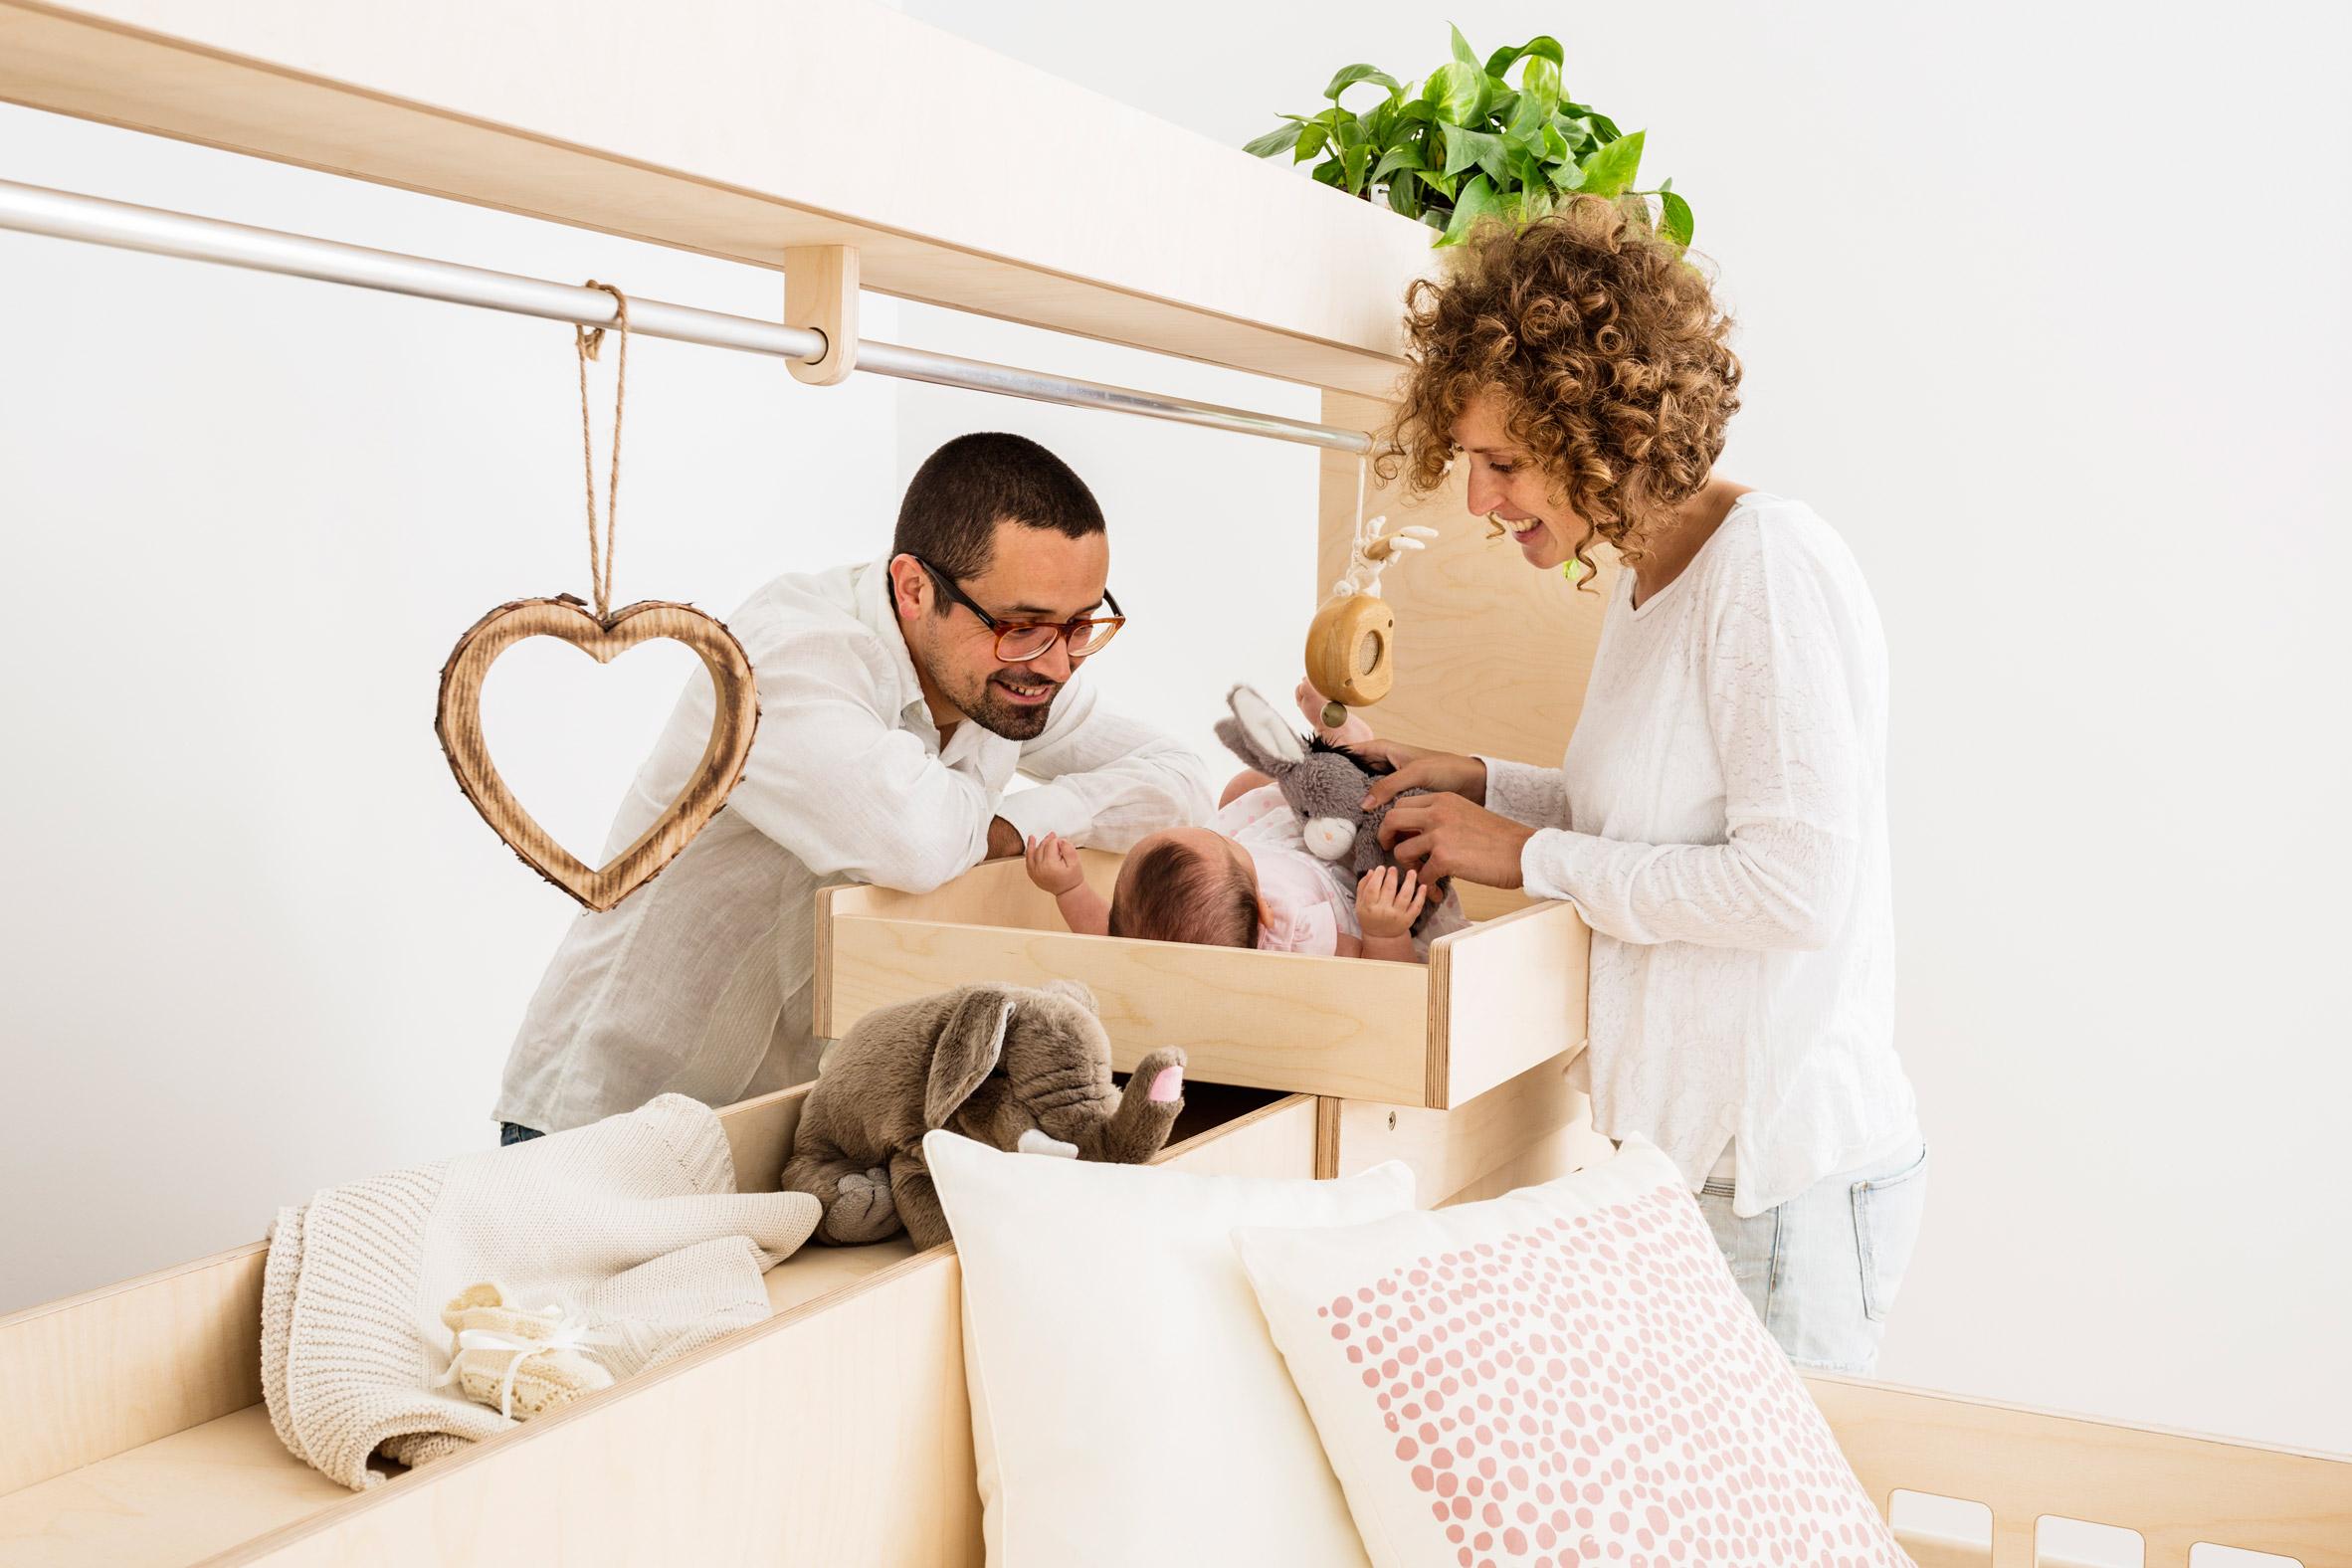 teehee-kids-furniture-europe-plywood-textiles_dezeen_2364_col_0